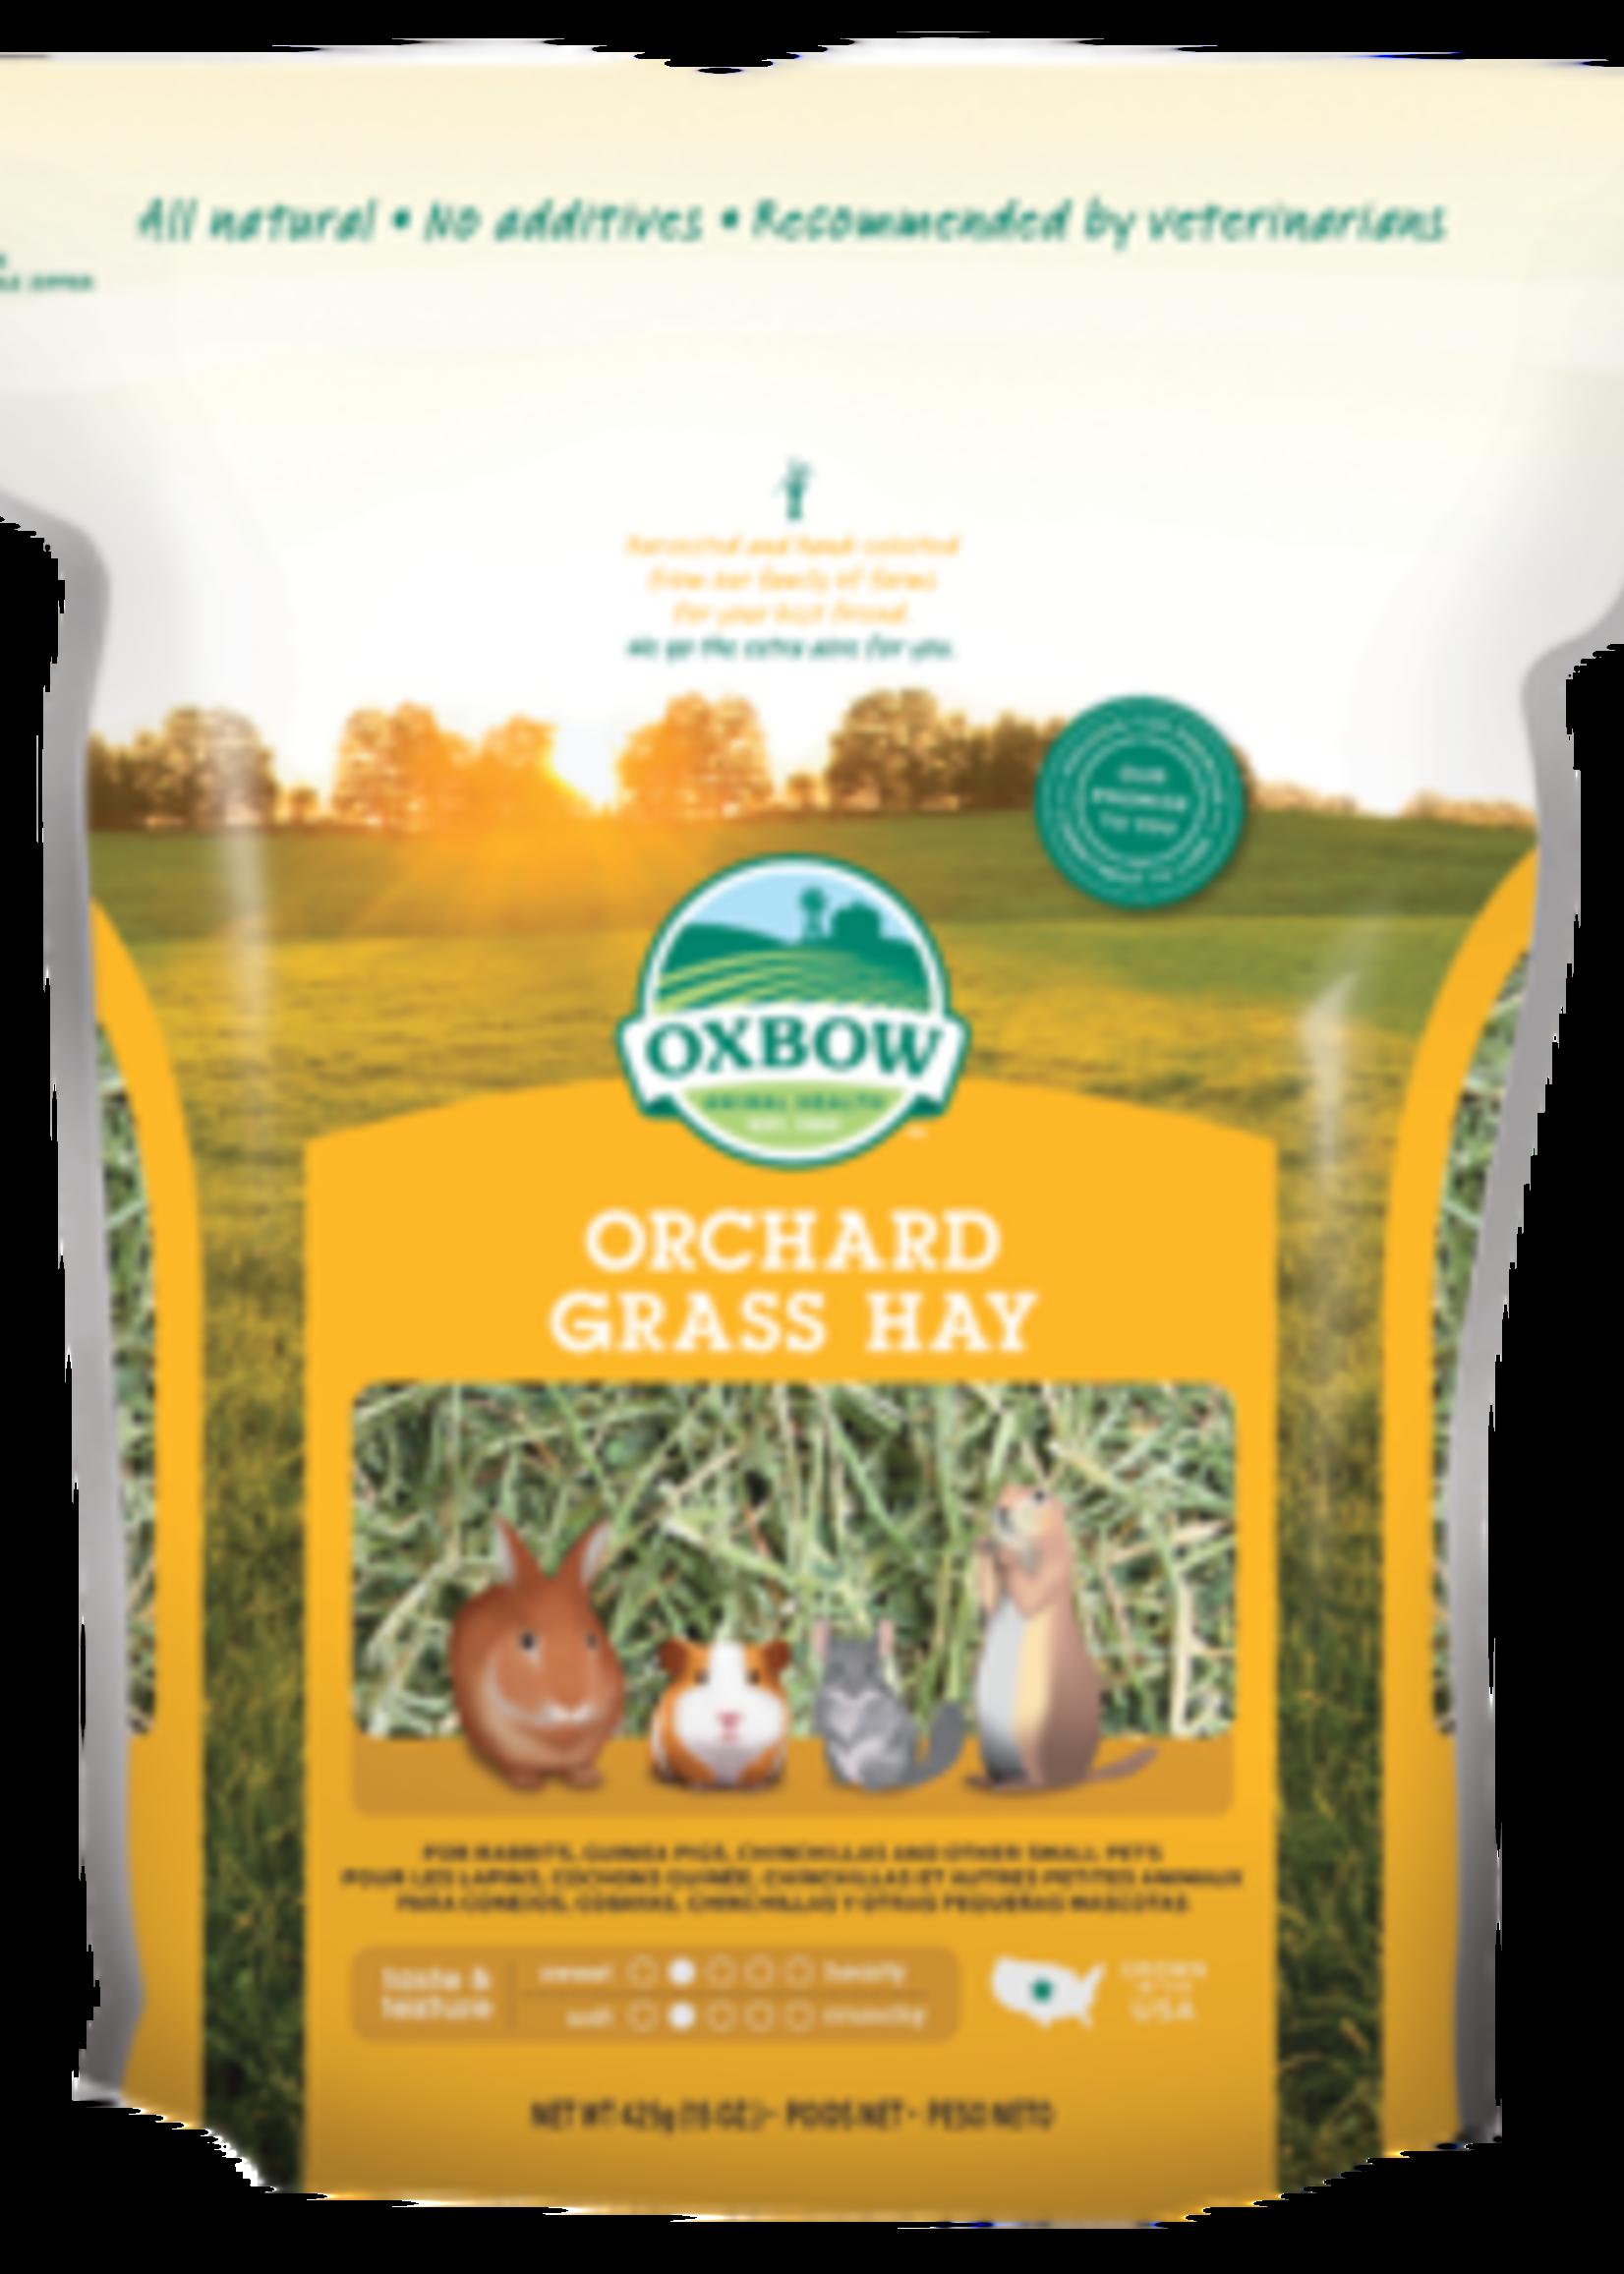 Oxbow Animal Health™ OXBOW ORCHARD GRASS HAY 15oz